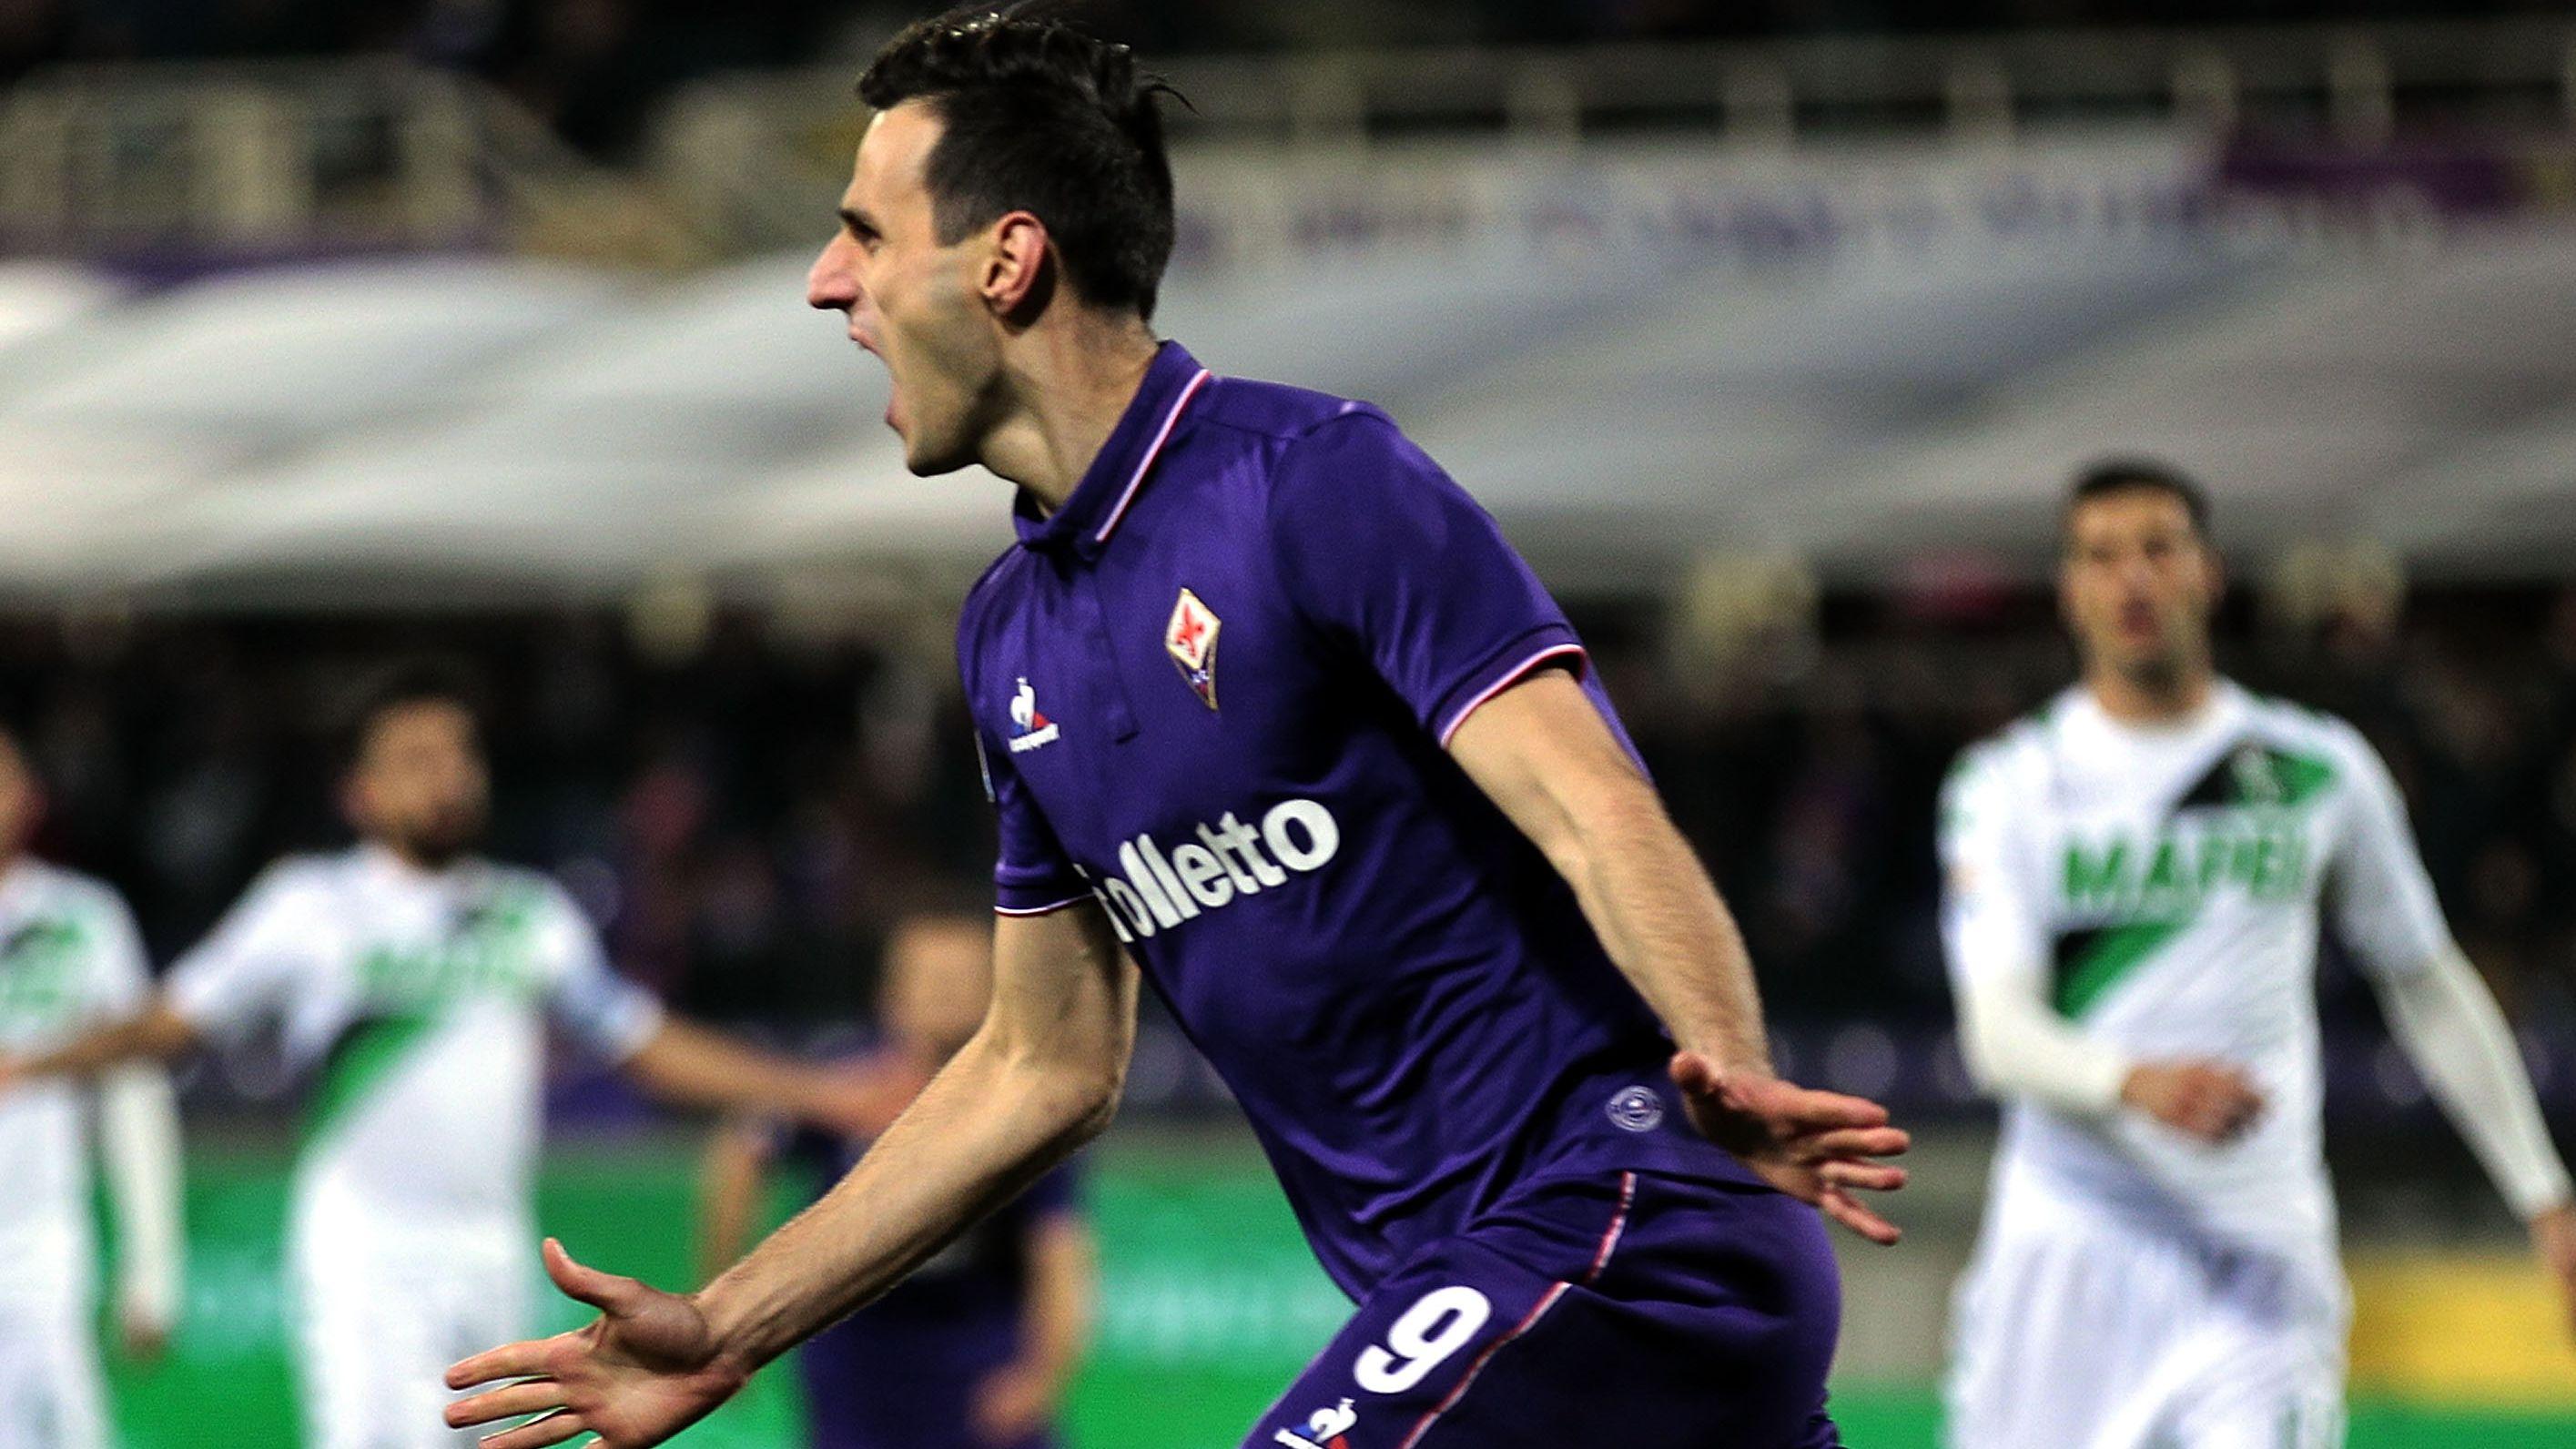 Chievo-Fiorentina, Sousa: